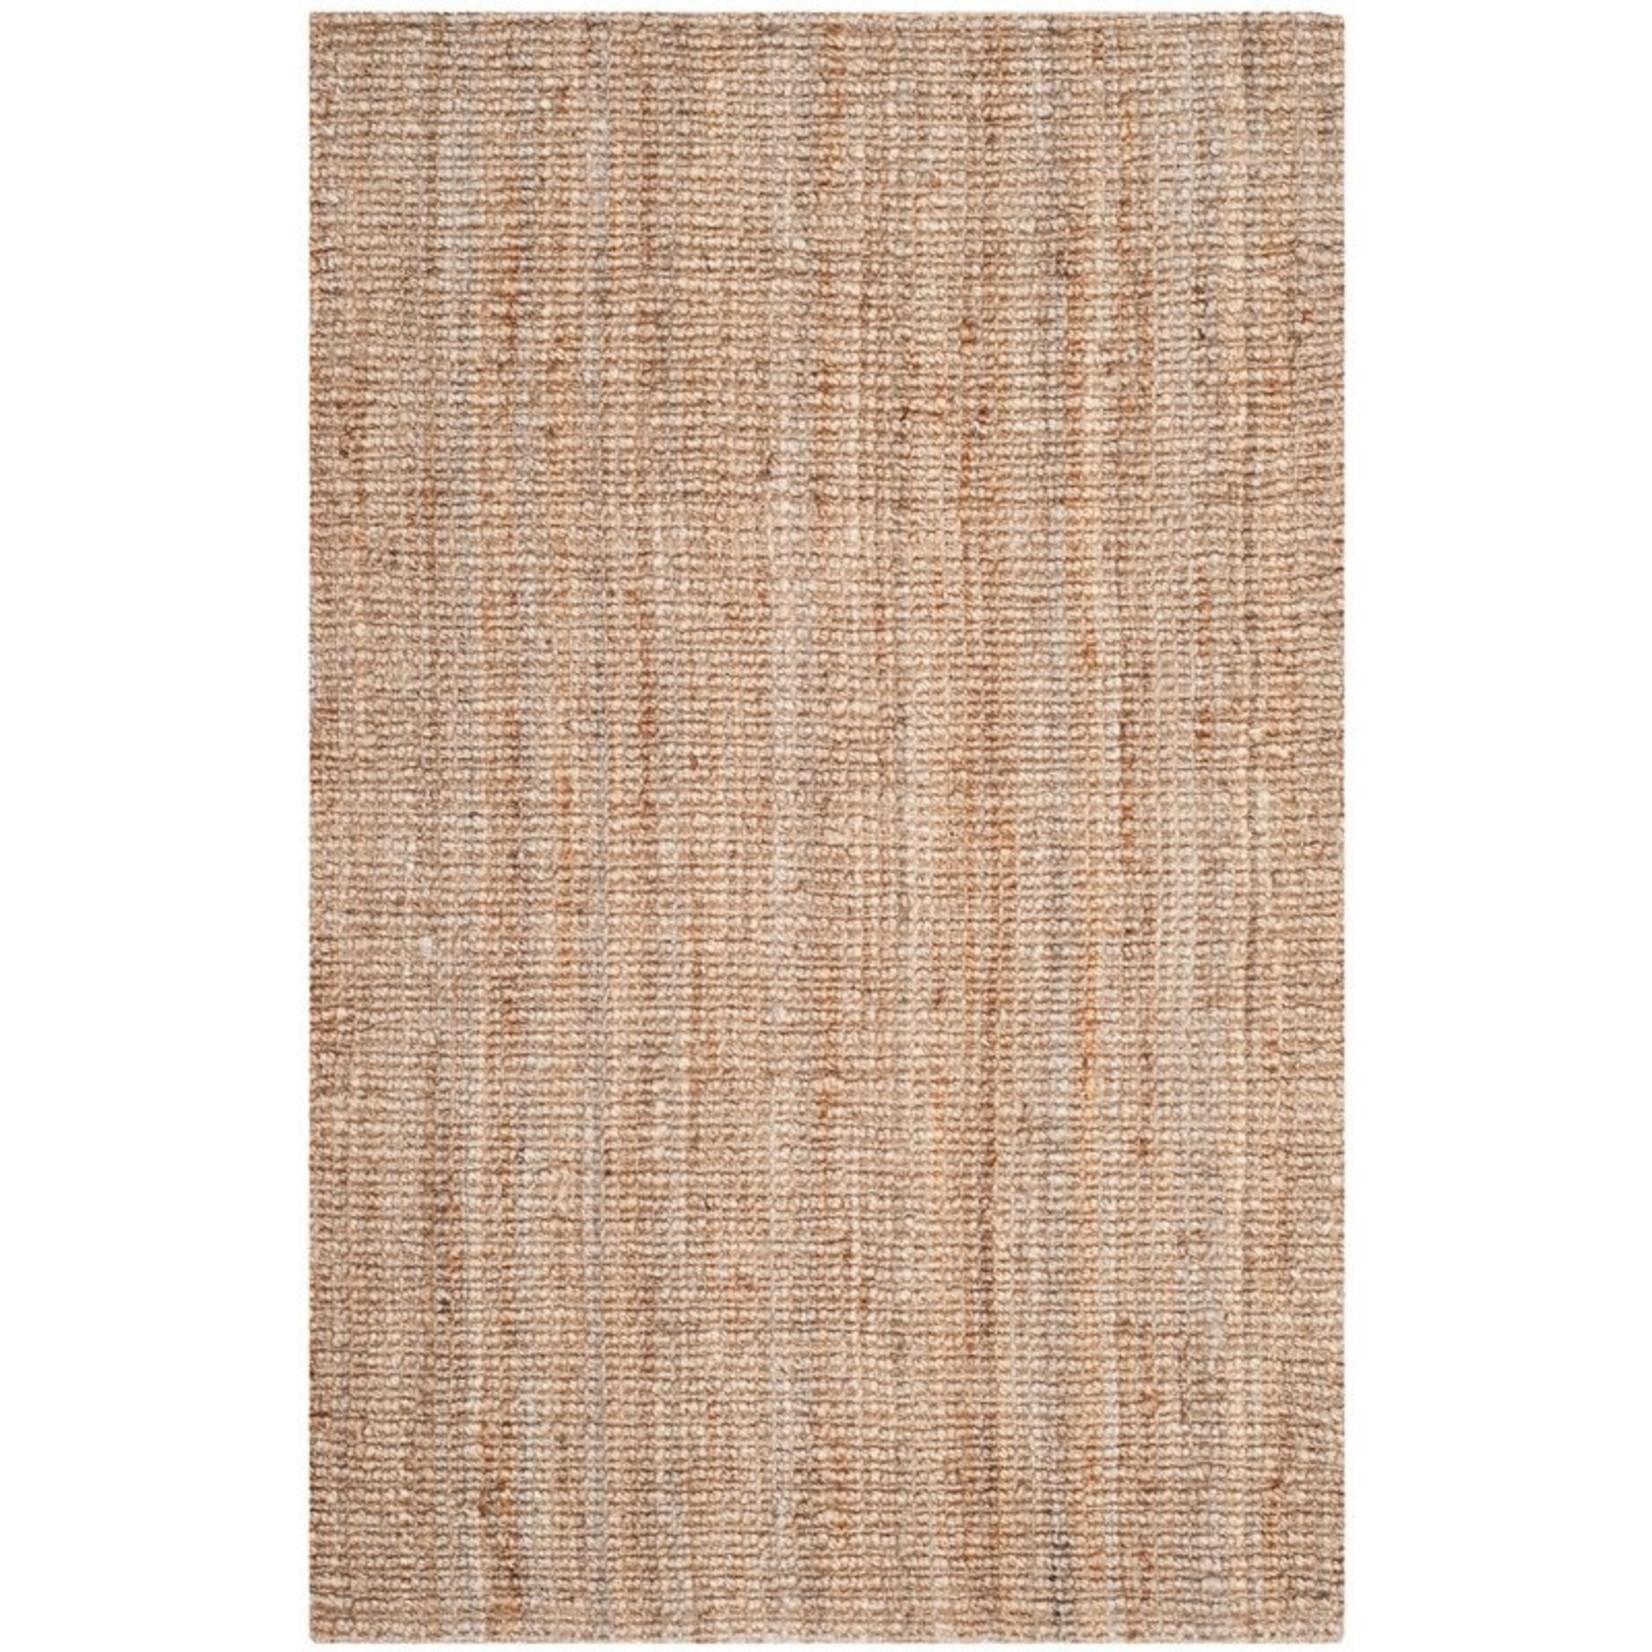 *4' x 6' - Grassmere Handmade Jute Natural Area Rug